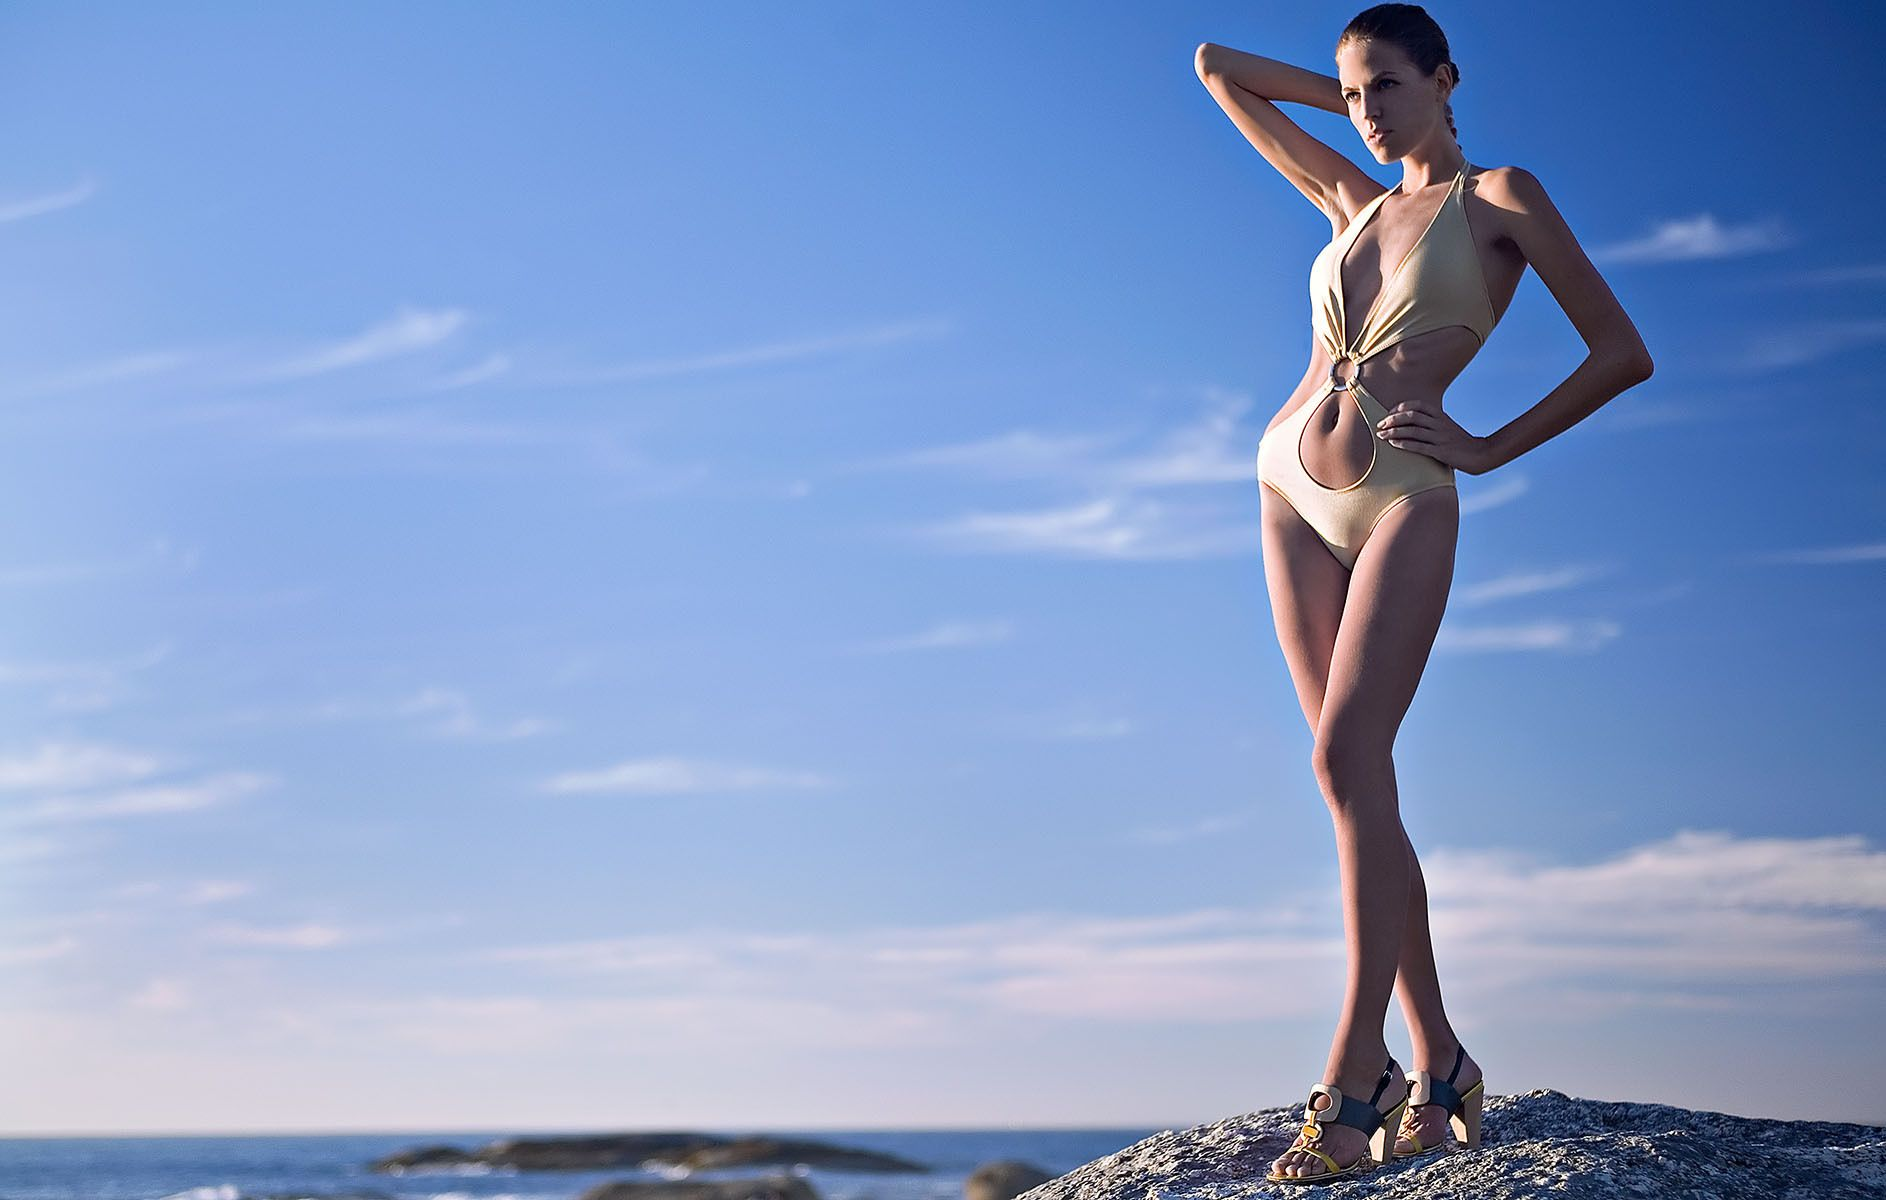 Model: Eveline Zelda